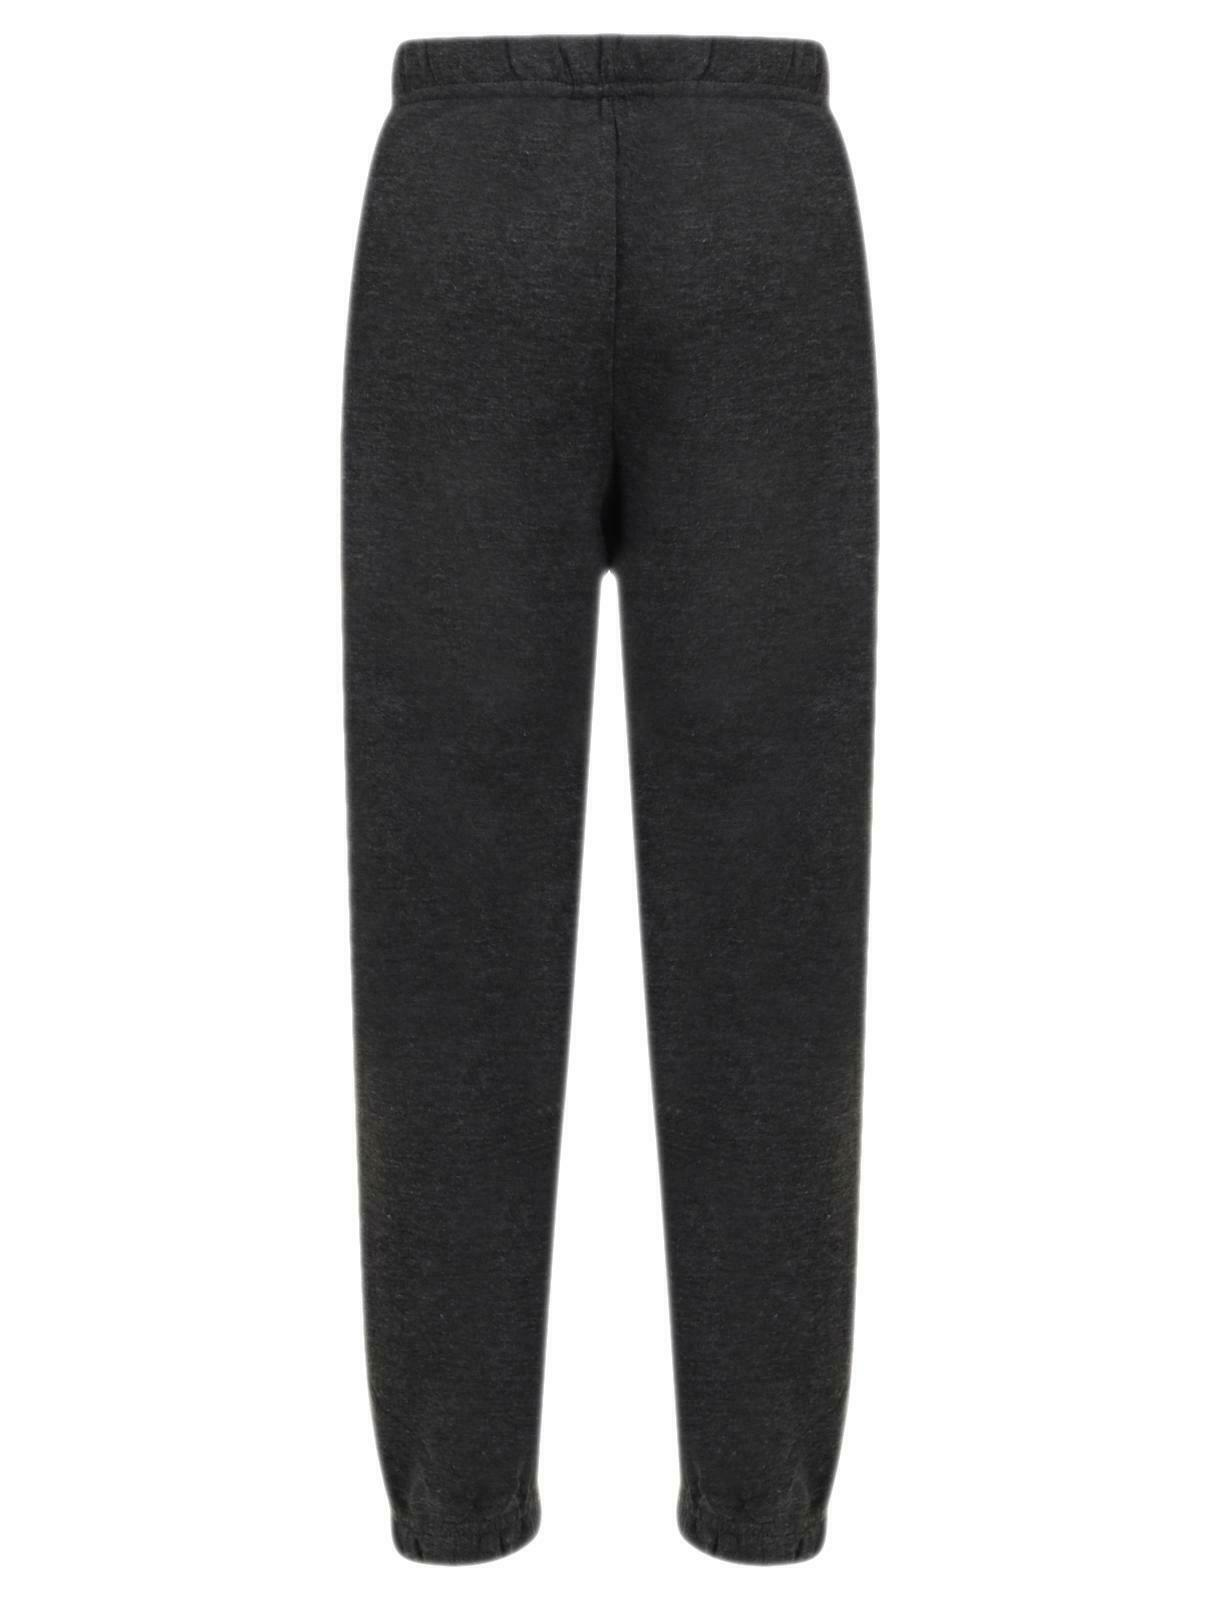 Kids Fleece Trouser Charcoal